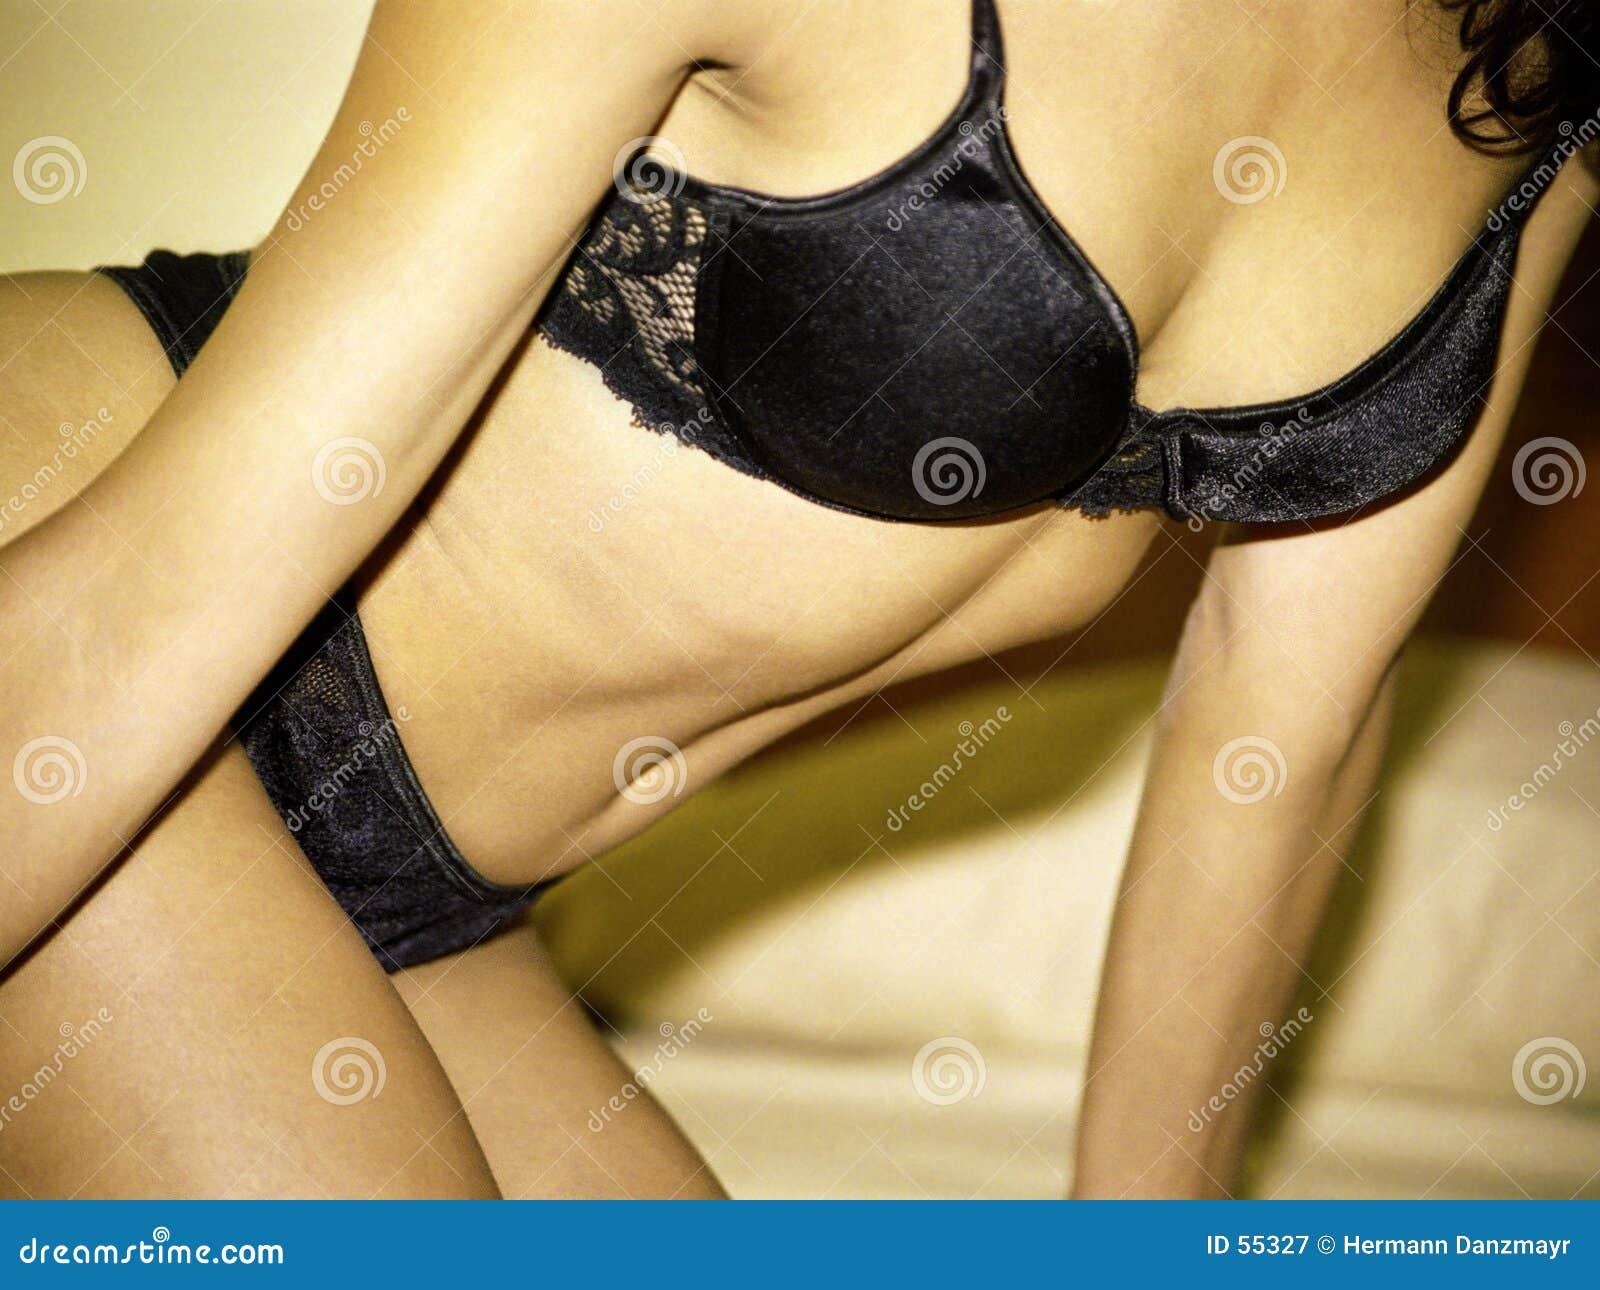 Download Lingerie στοκ εικόνα. εικόνα από φίλη, bodybuilders, φταμένο - 55327